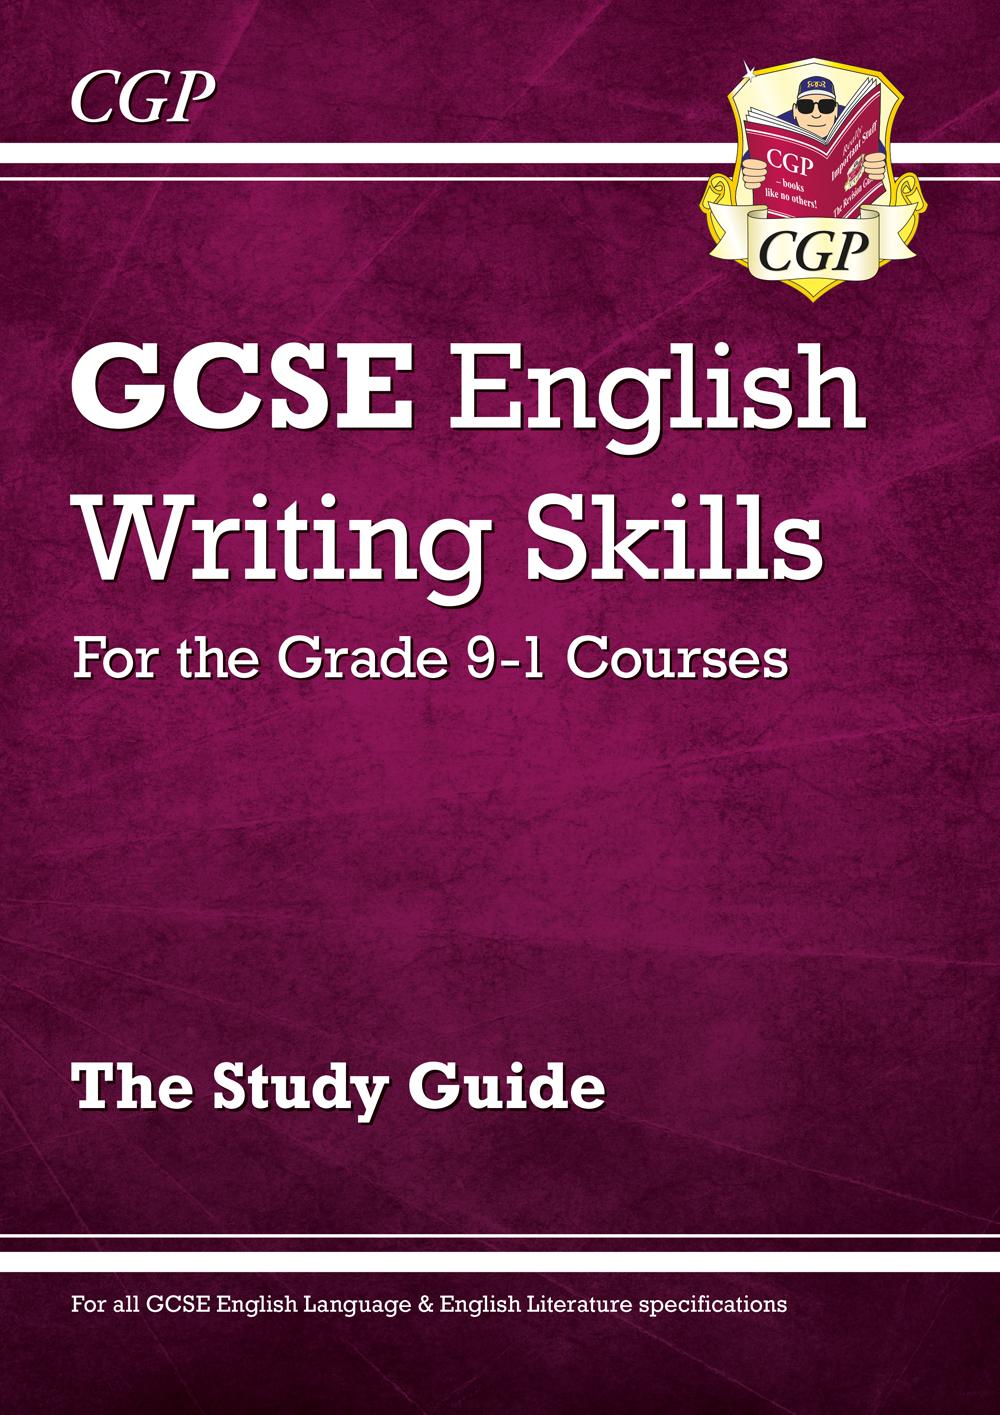 GCSE English | CGP Books